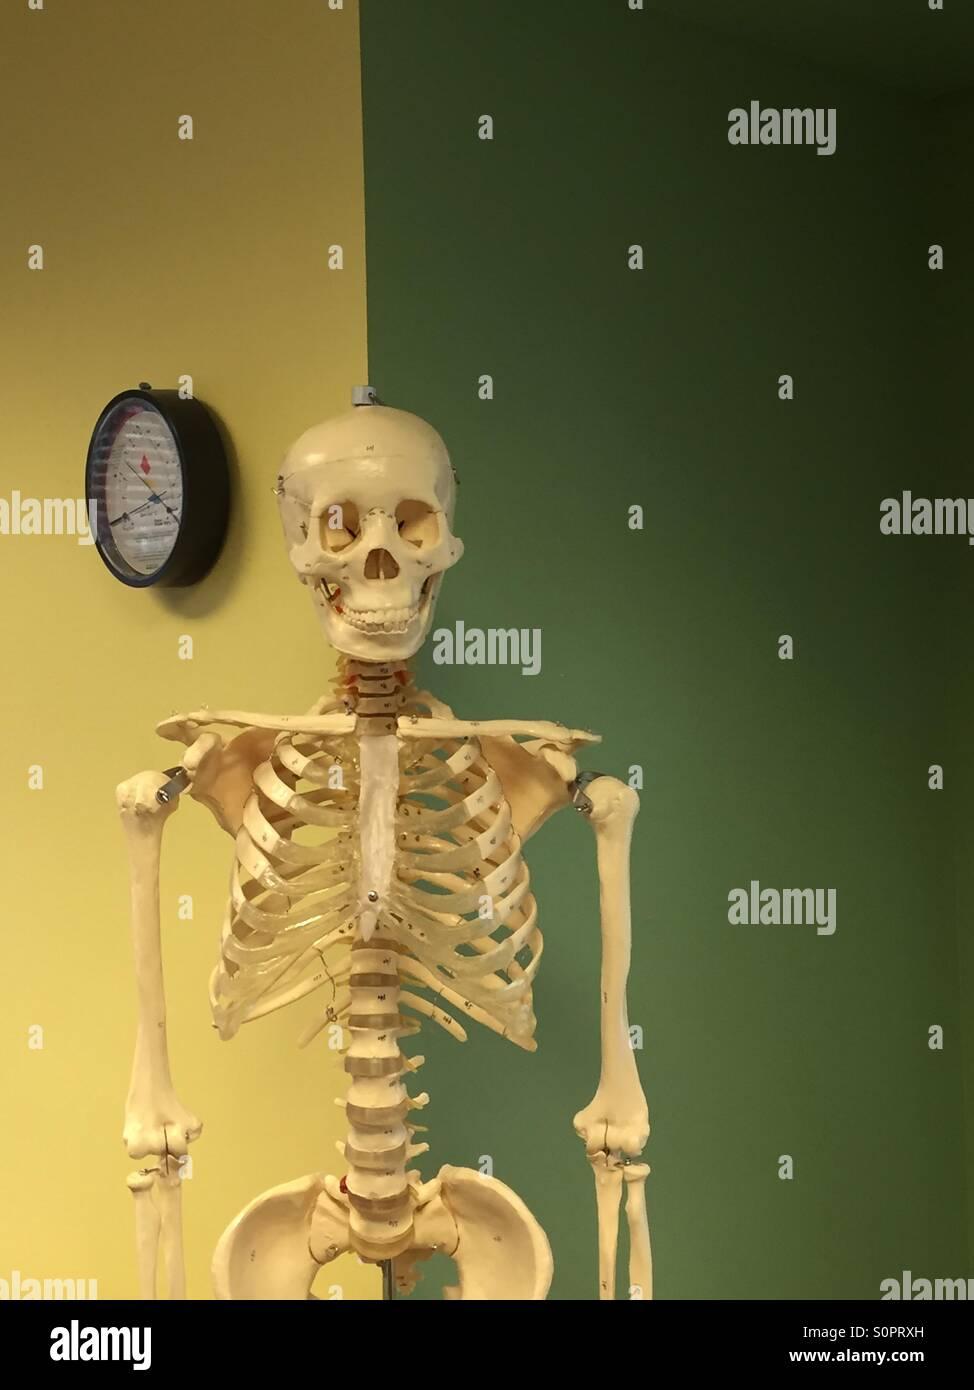 Skeleton. - Stock Image